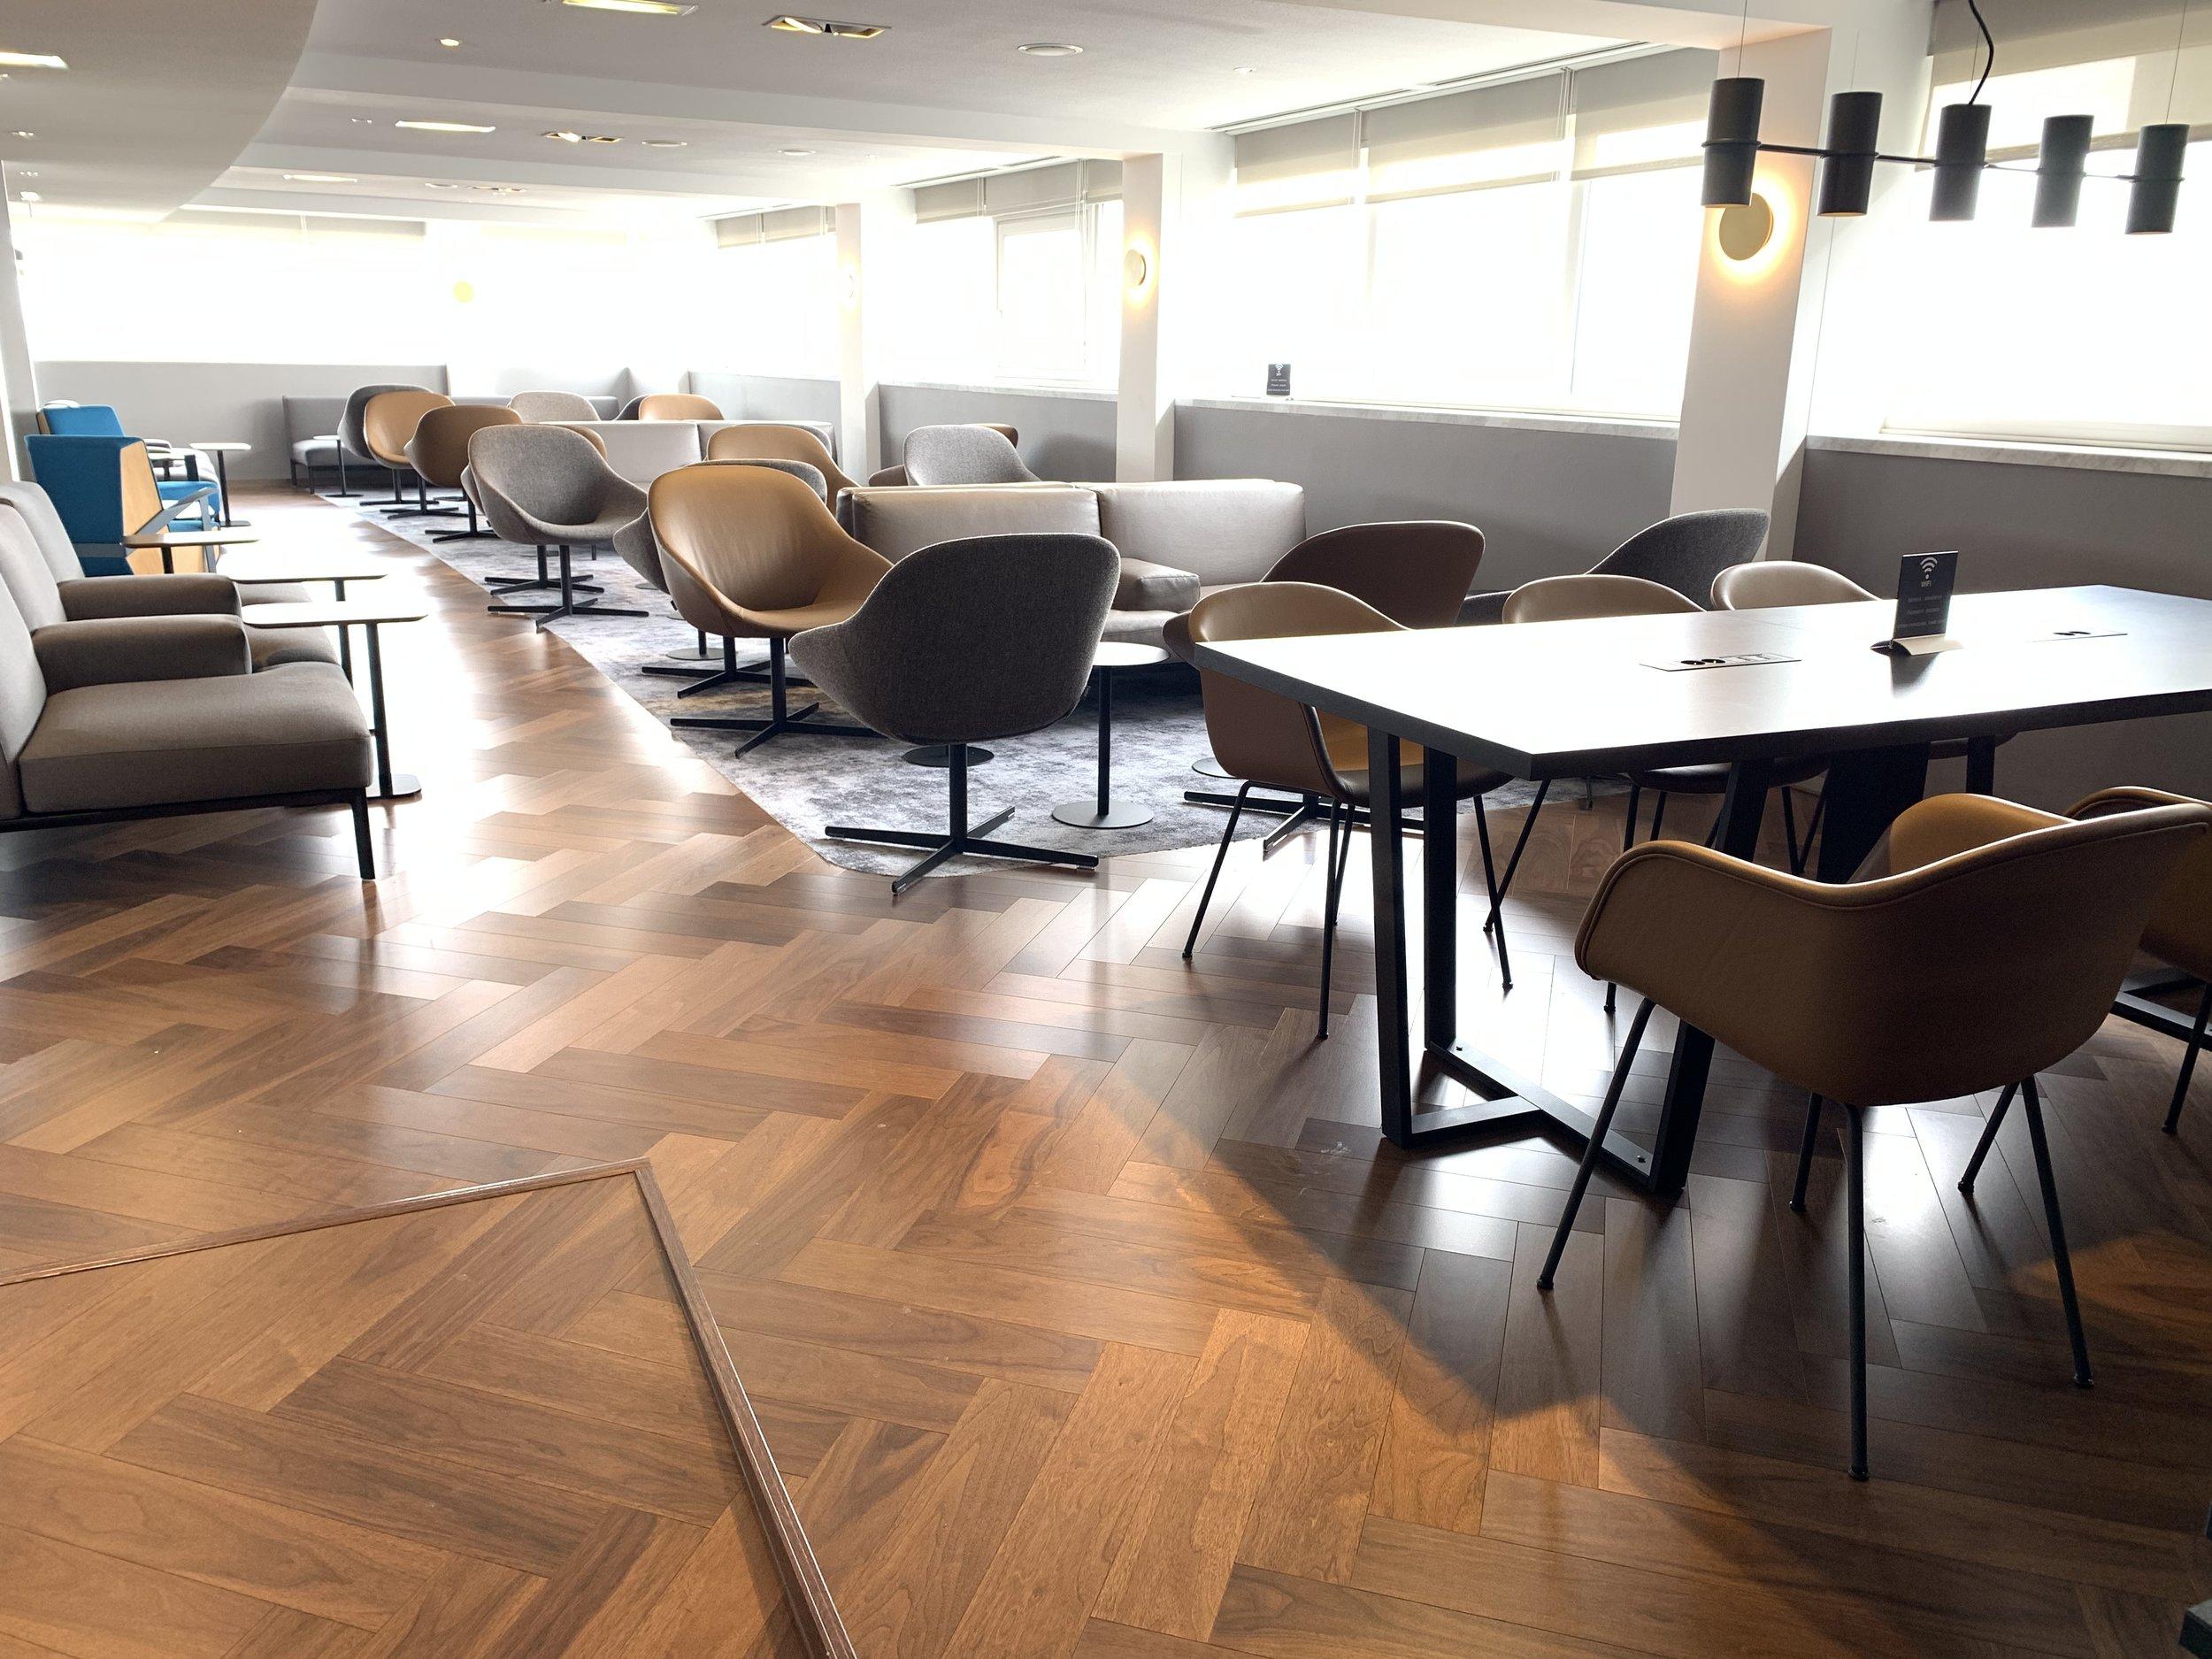 New Refurbished Star Alliance Lounge Paris Charles De Gaulle 6.jpeg